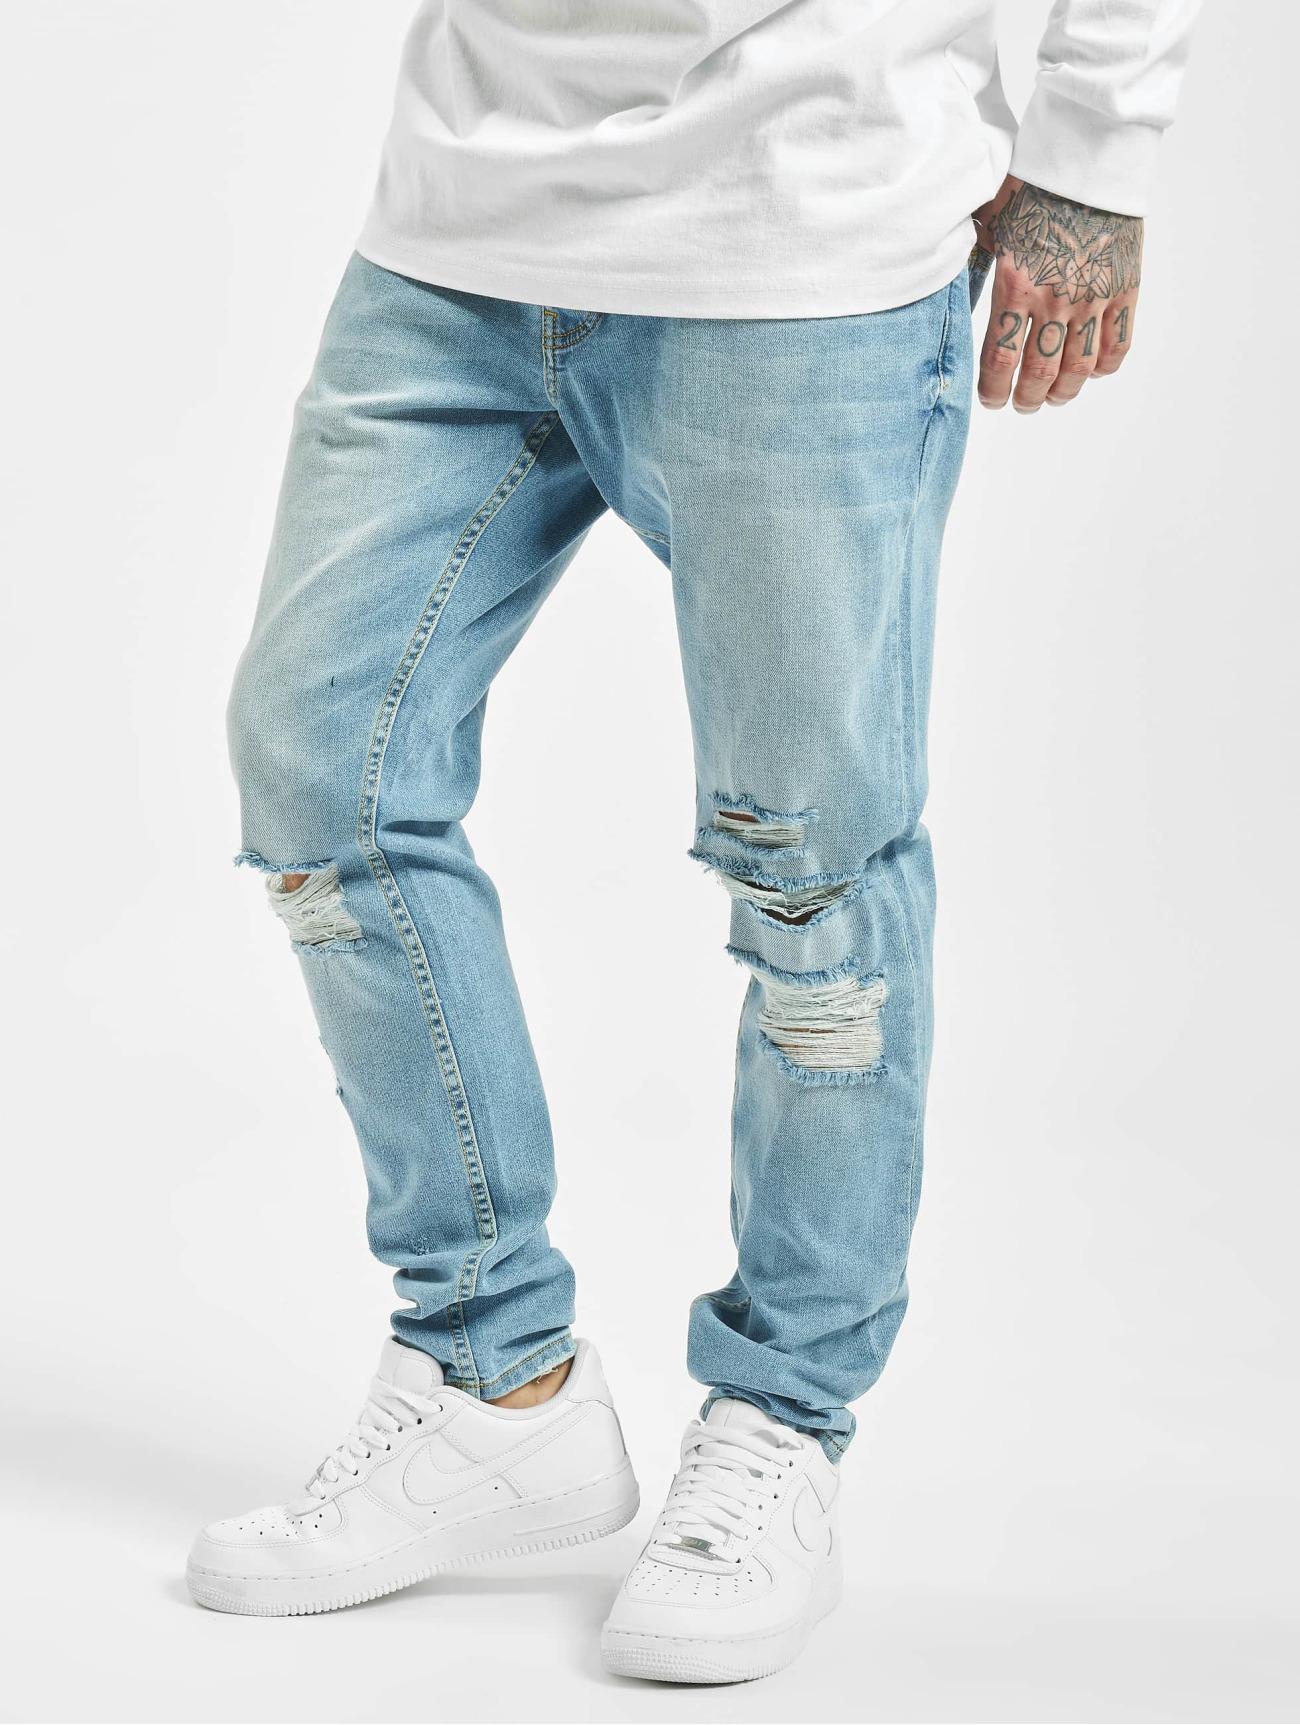 2Y  Ener  bleu Homme Jean skinny  726592 Homme Jeans